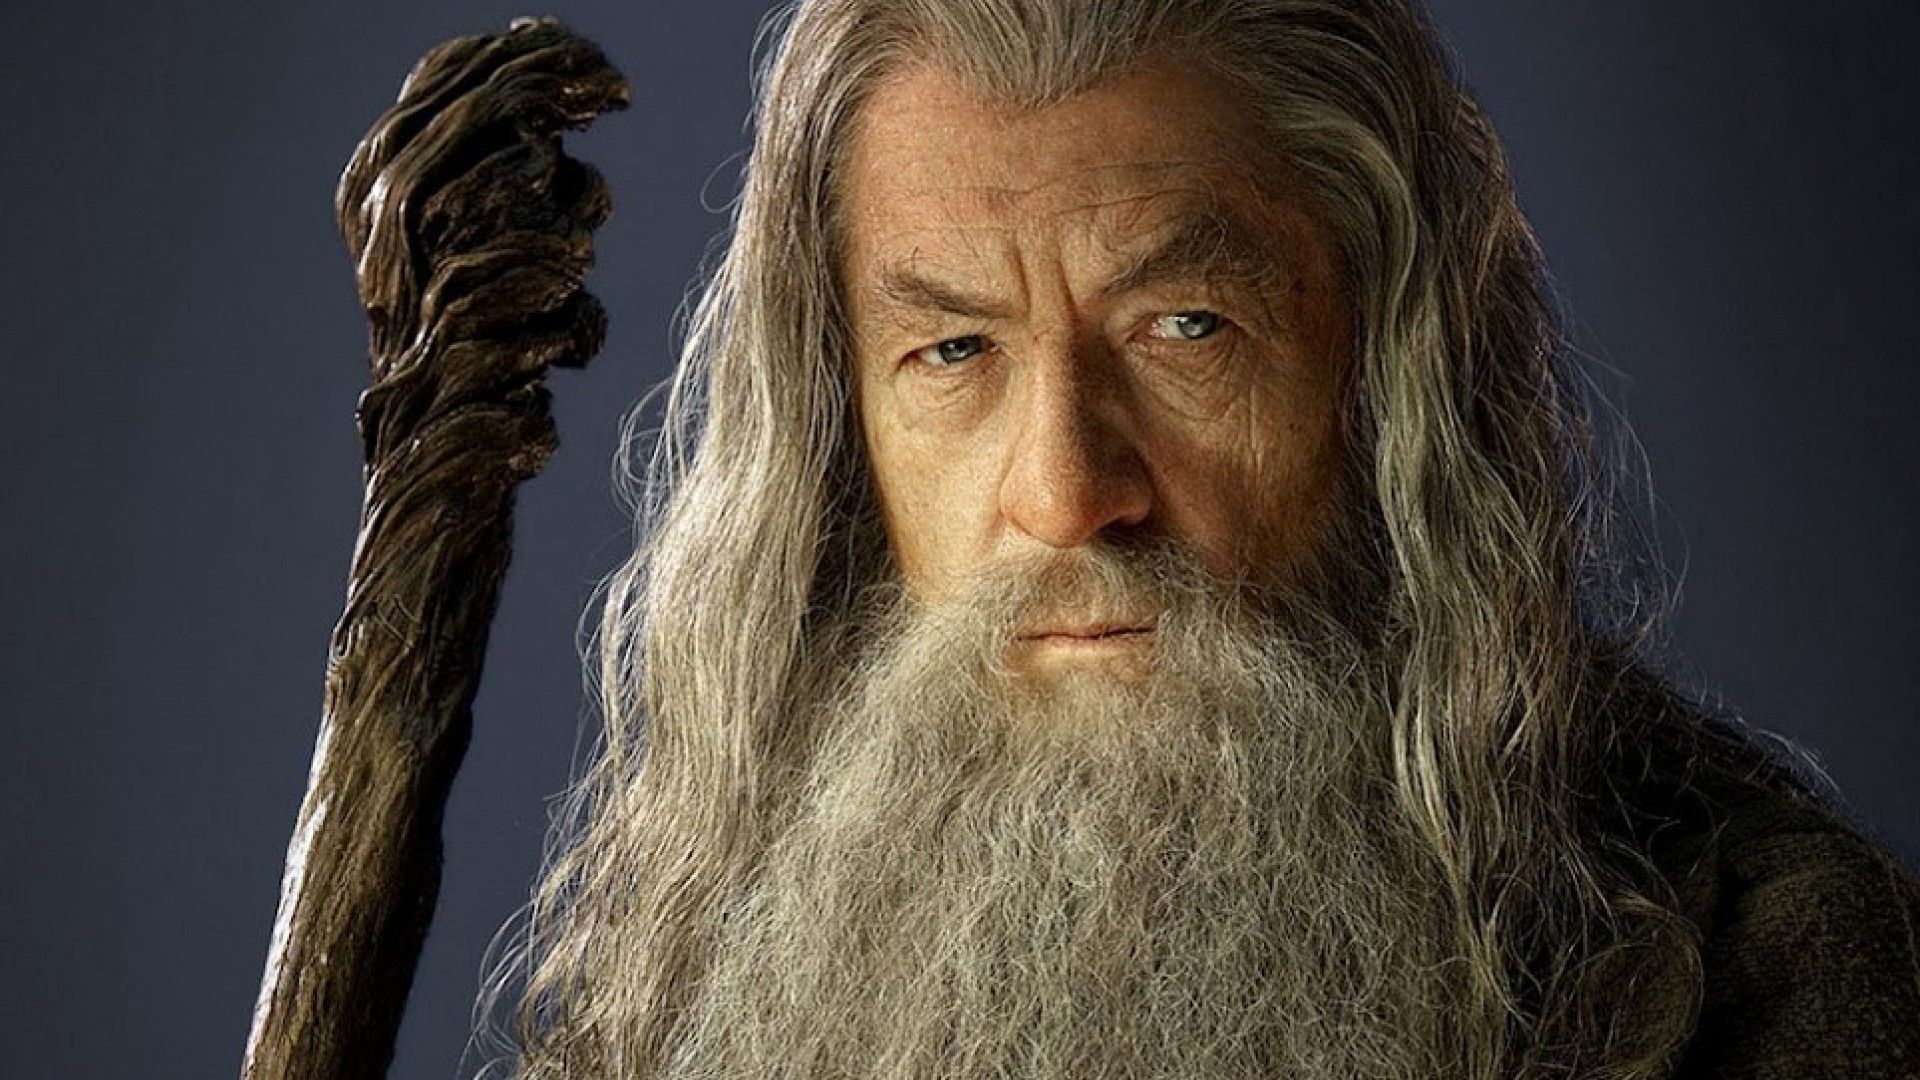 Gandalf the Grey - Gandalf Wallpaper (7018490) - Fanpop | tree ...